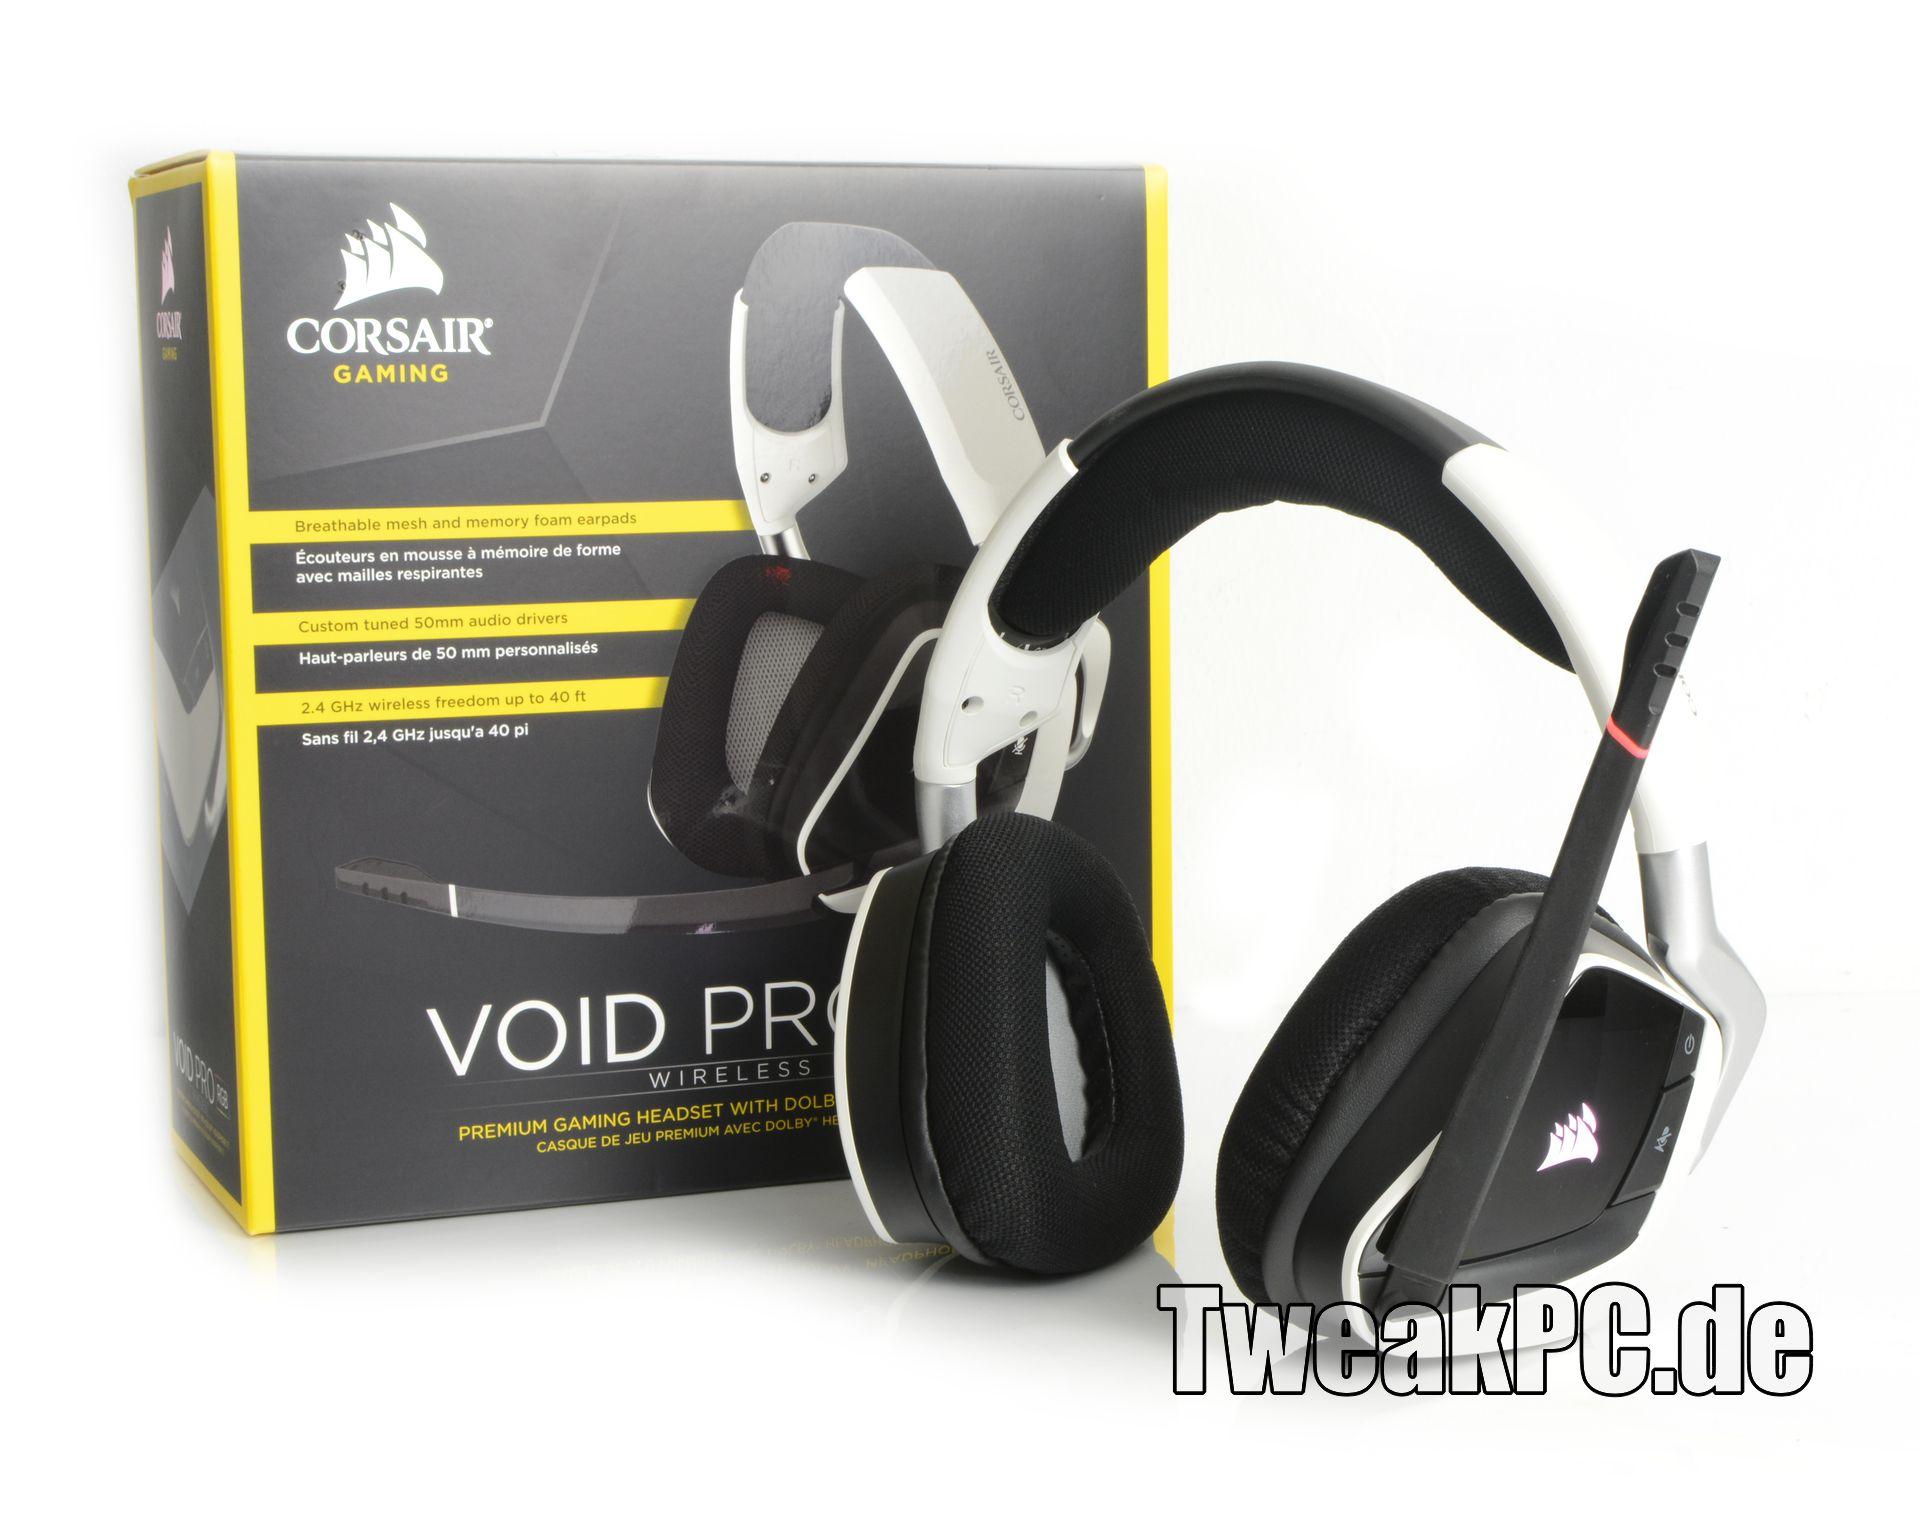 df4a92f62aa Corsair VOID PRO RGB Wireless Gaming-Headset im Test